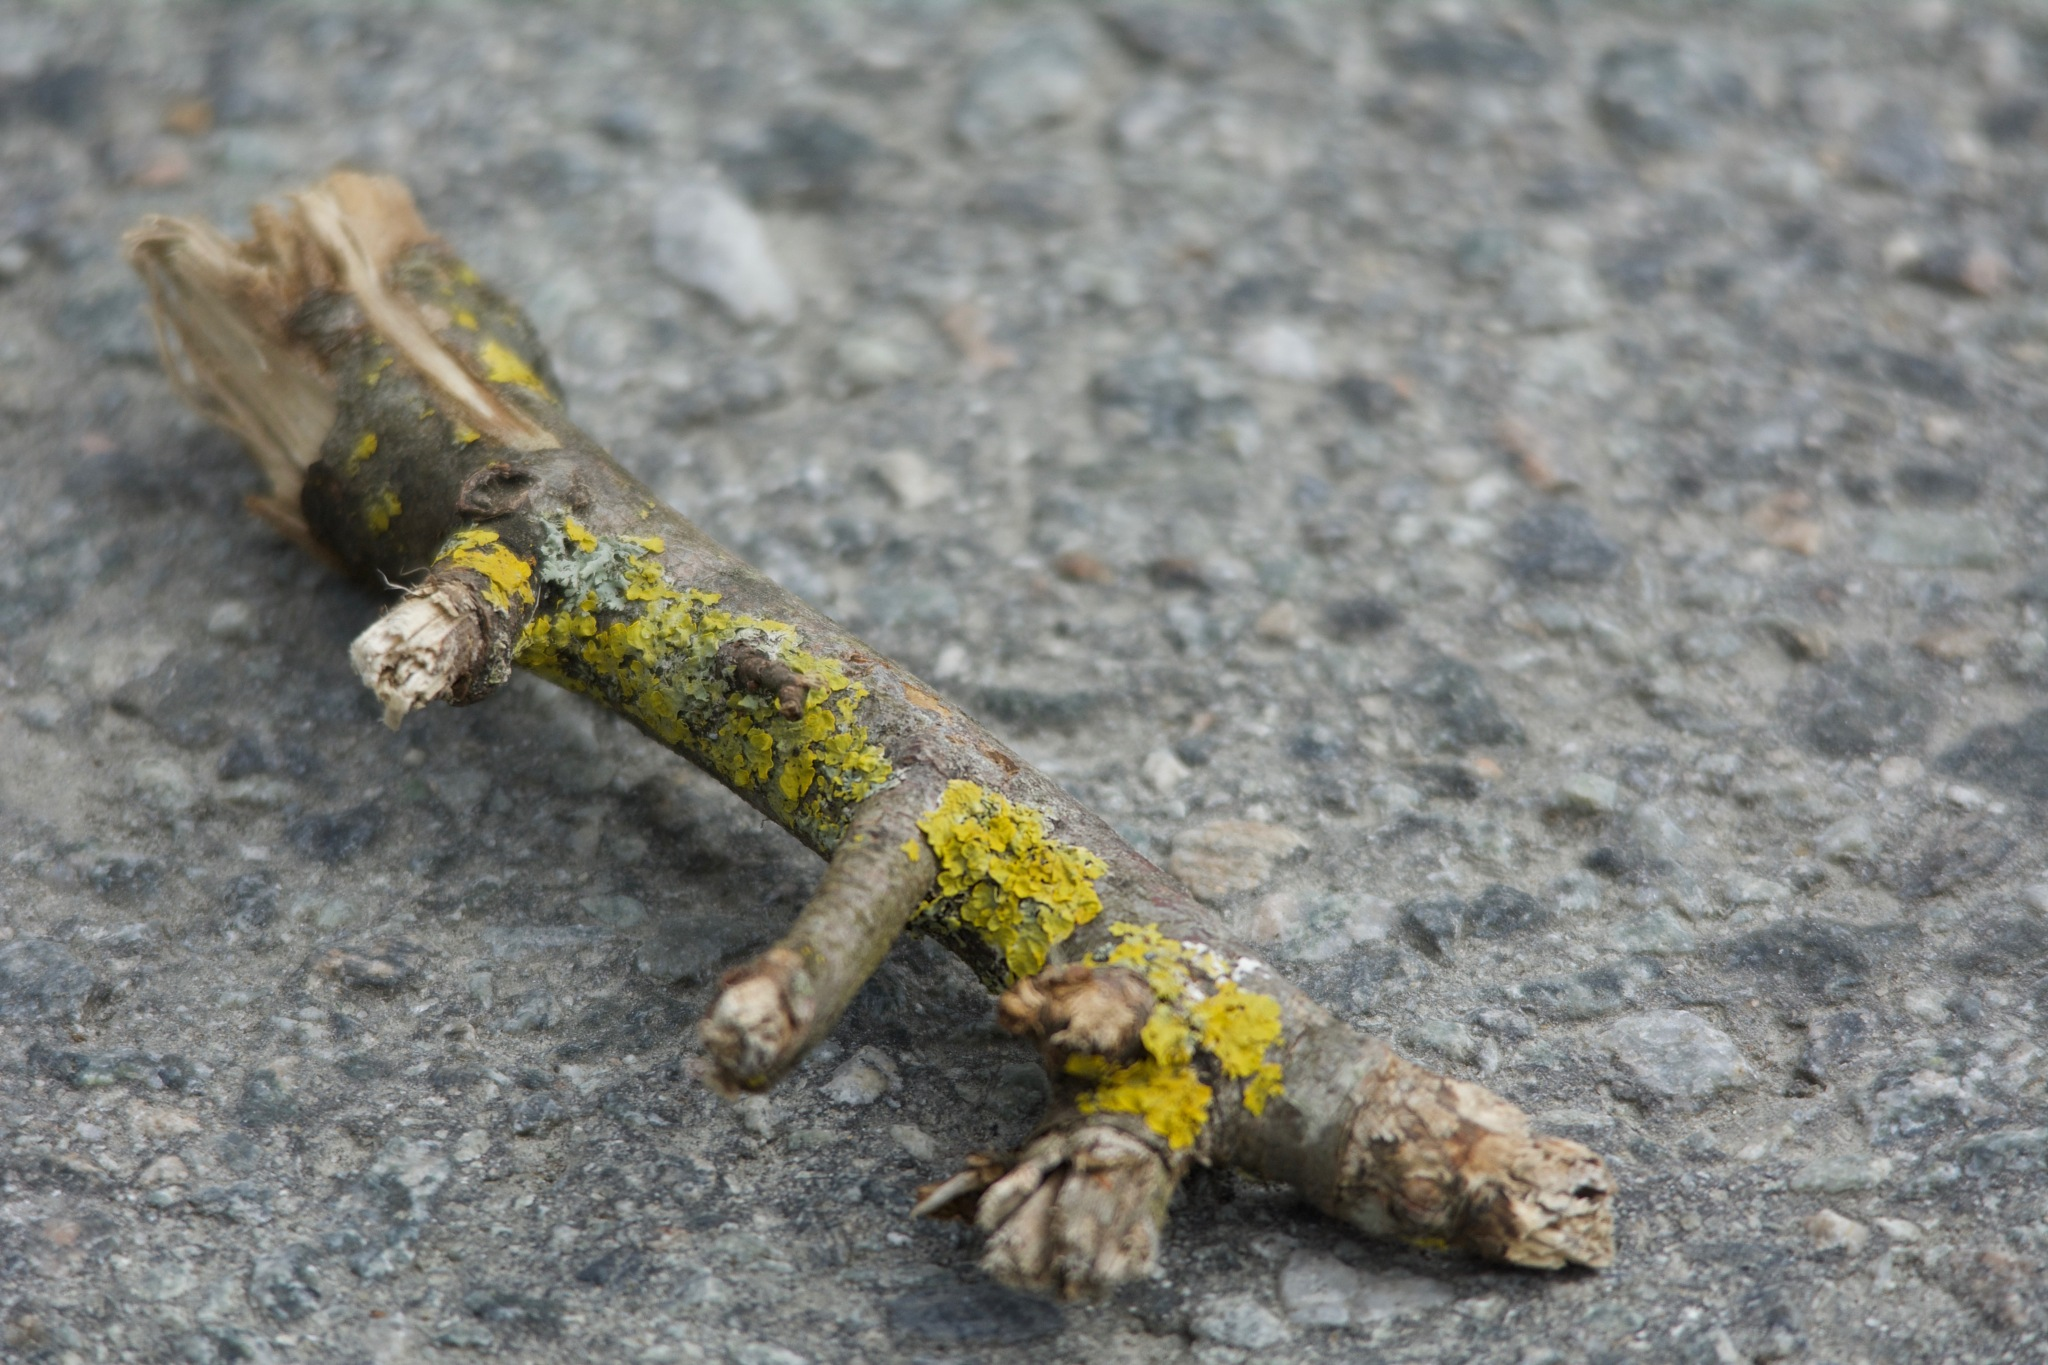 Twig 1.002 by Lars-Toralf Utnes Storstrand